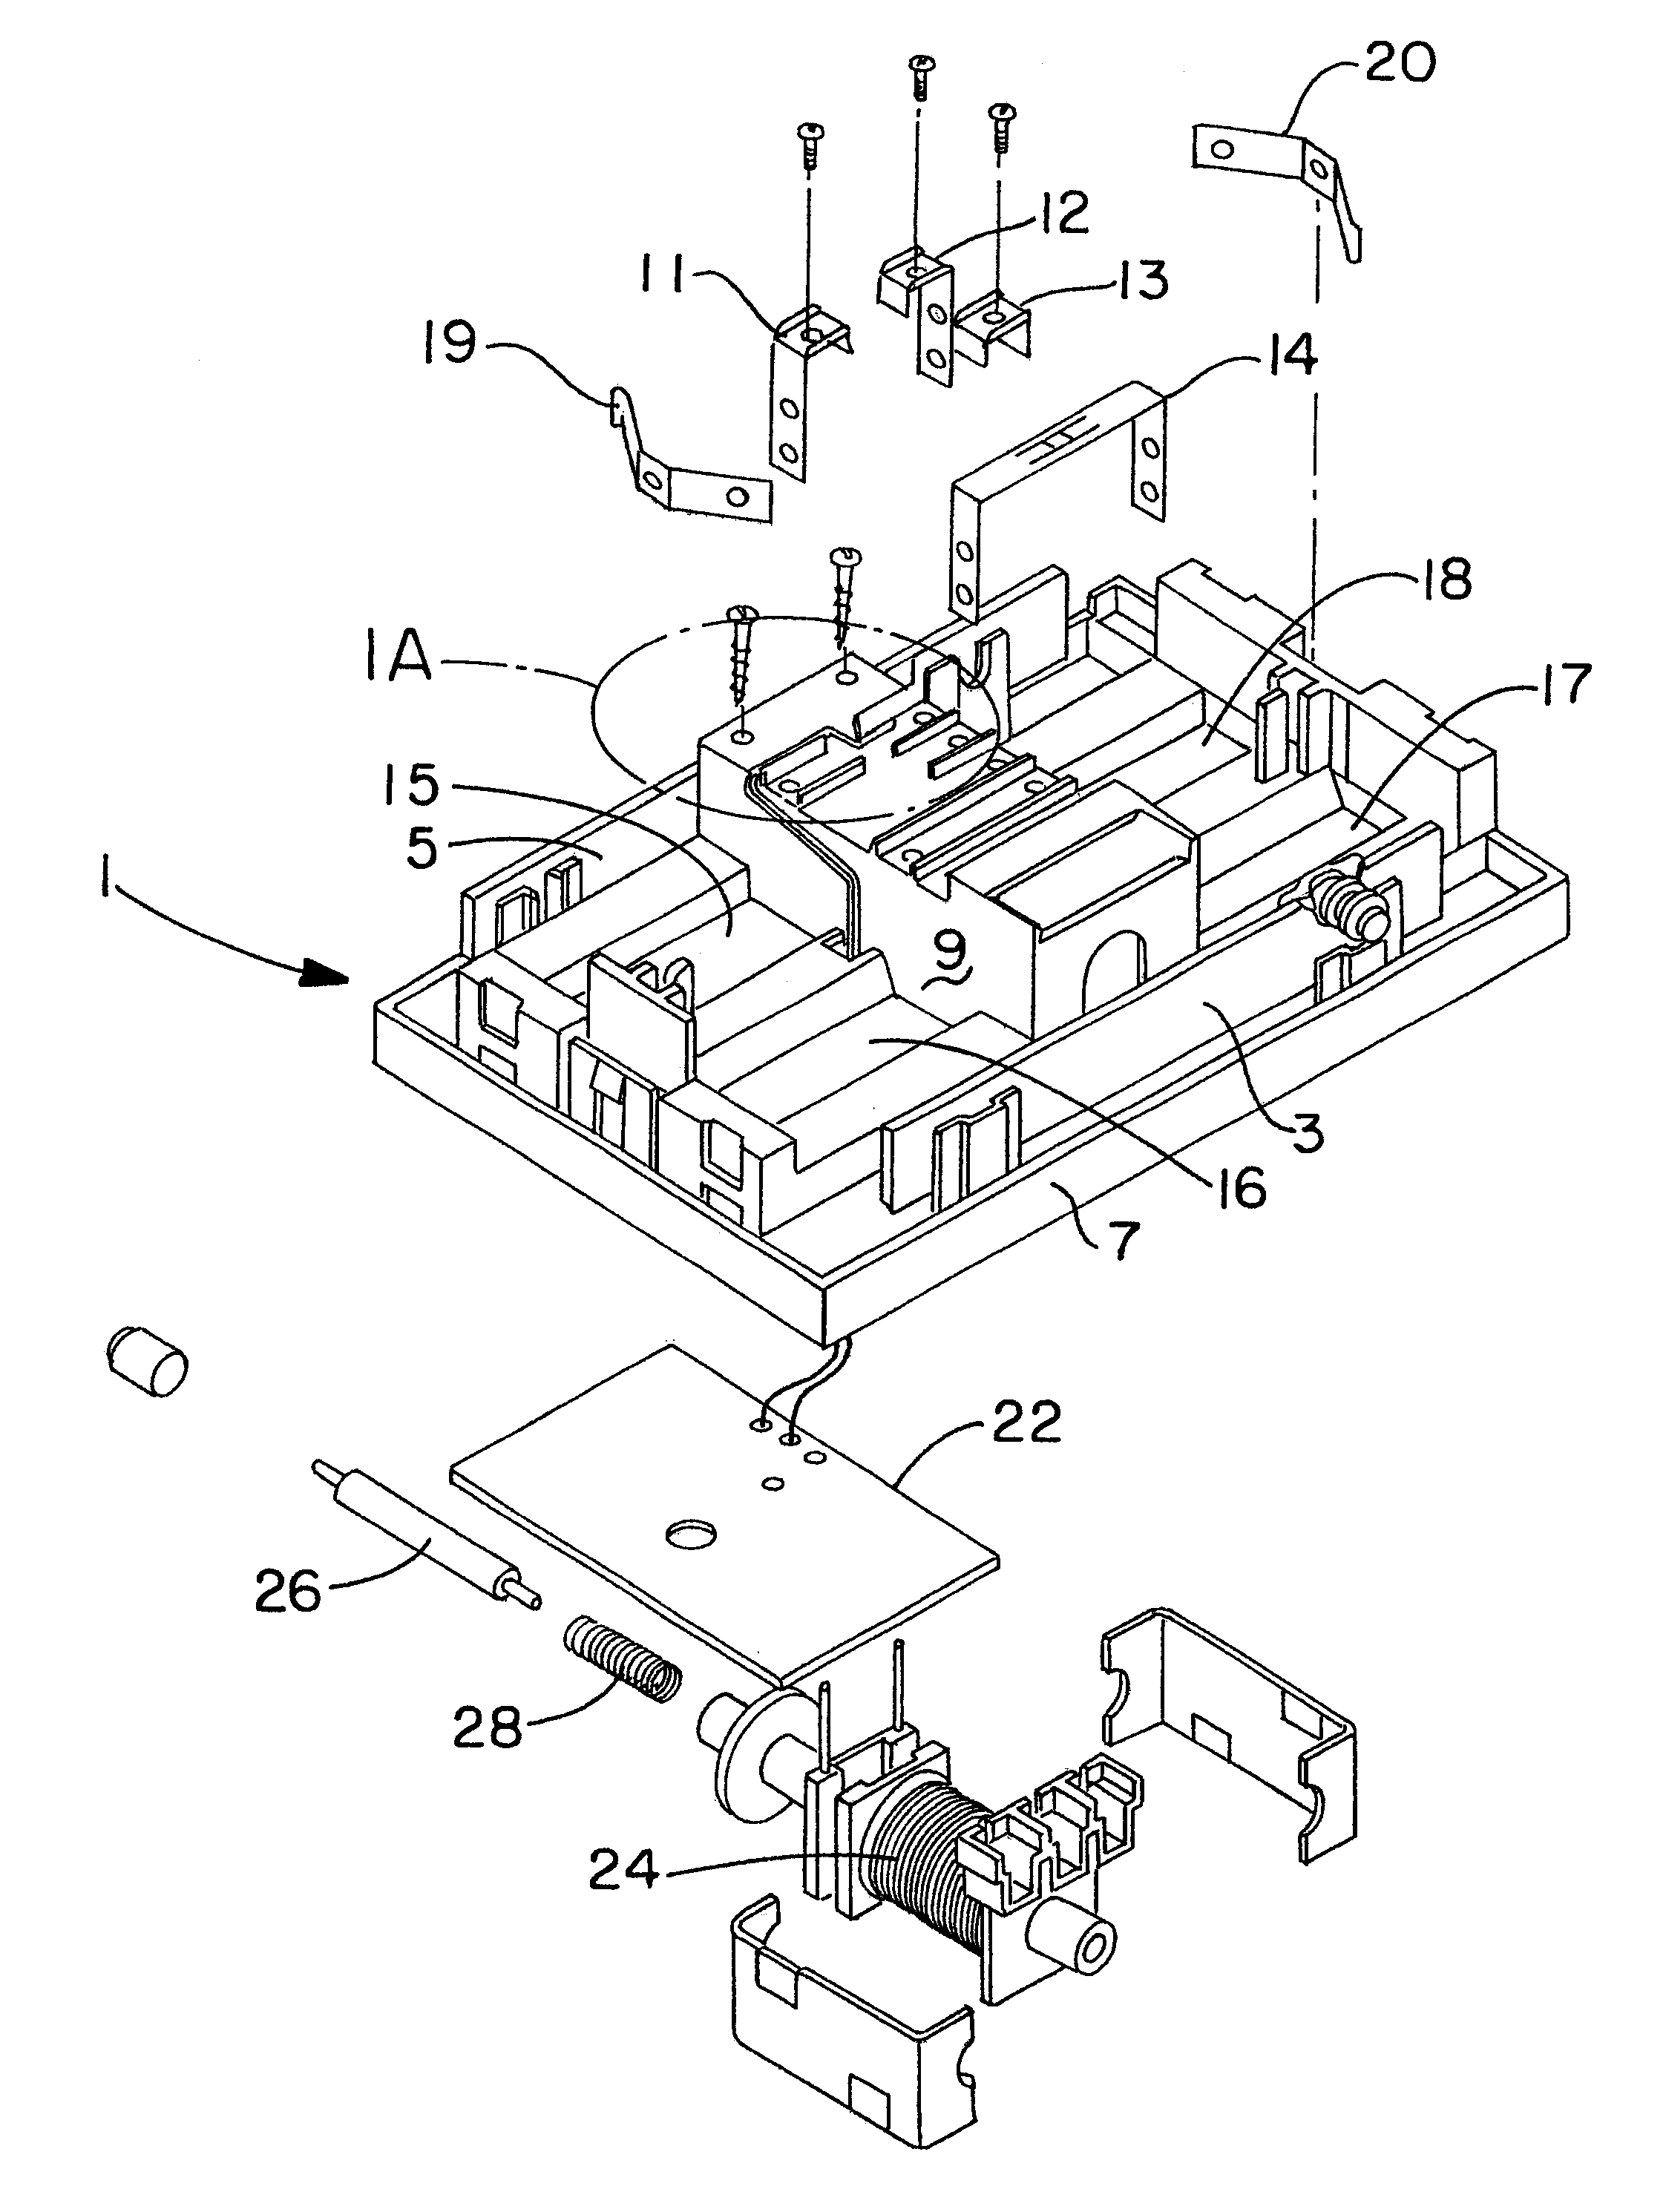 nutone doorbell wiring diagrams wiring diagrams free download car alarm wiring  diagrams free download automotive wiring